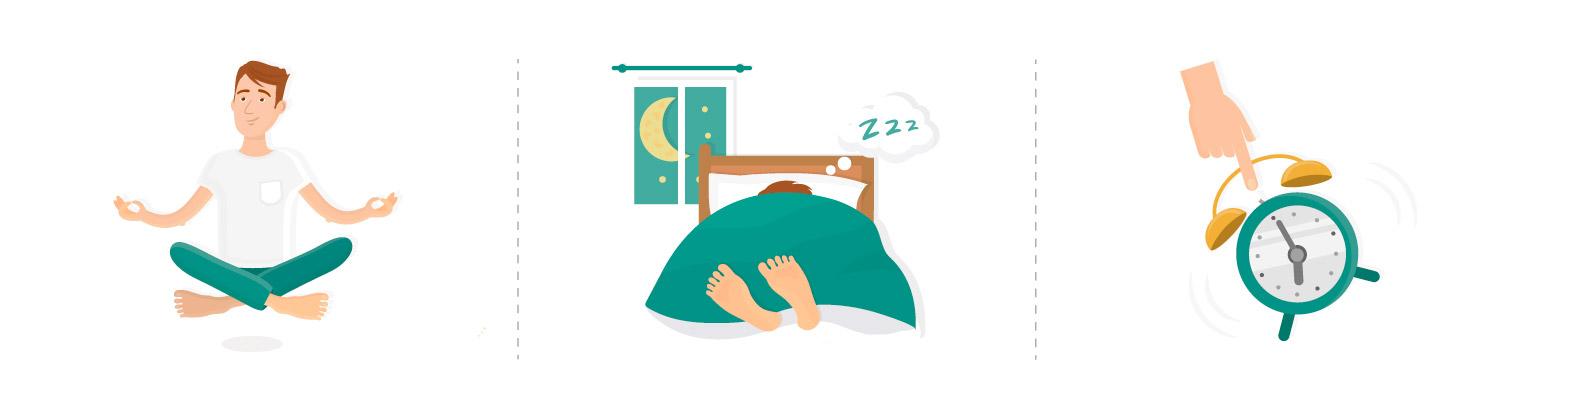 Better sleep and reduce stress